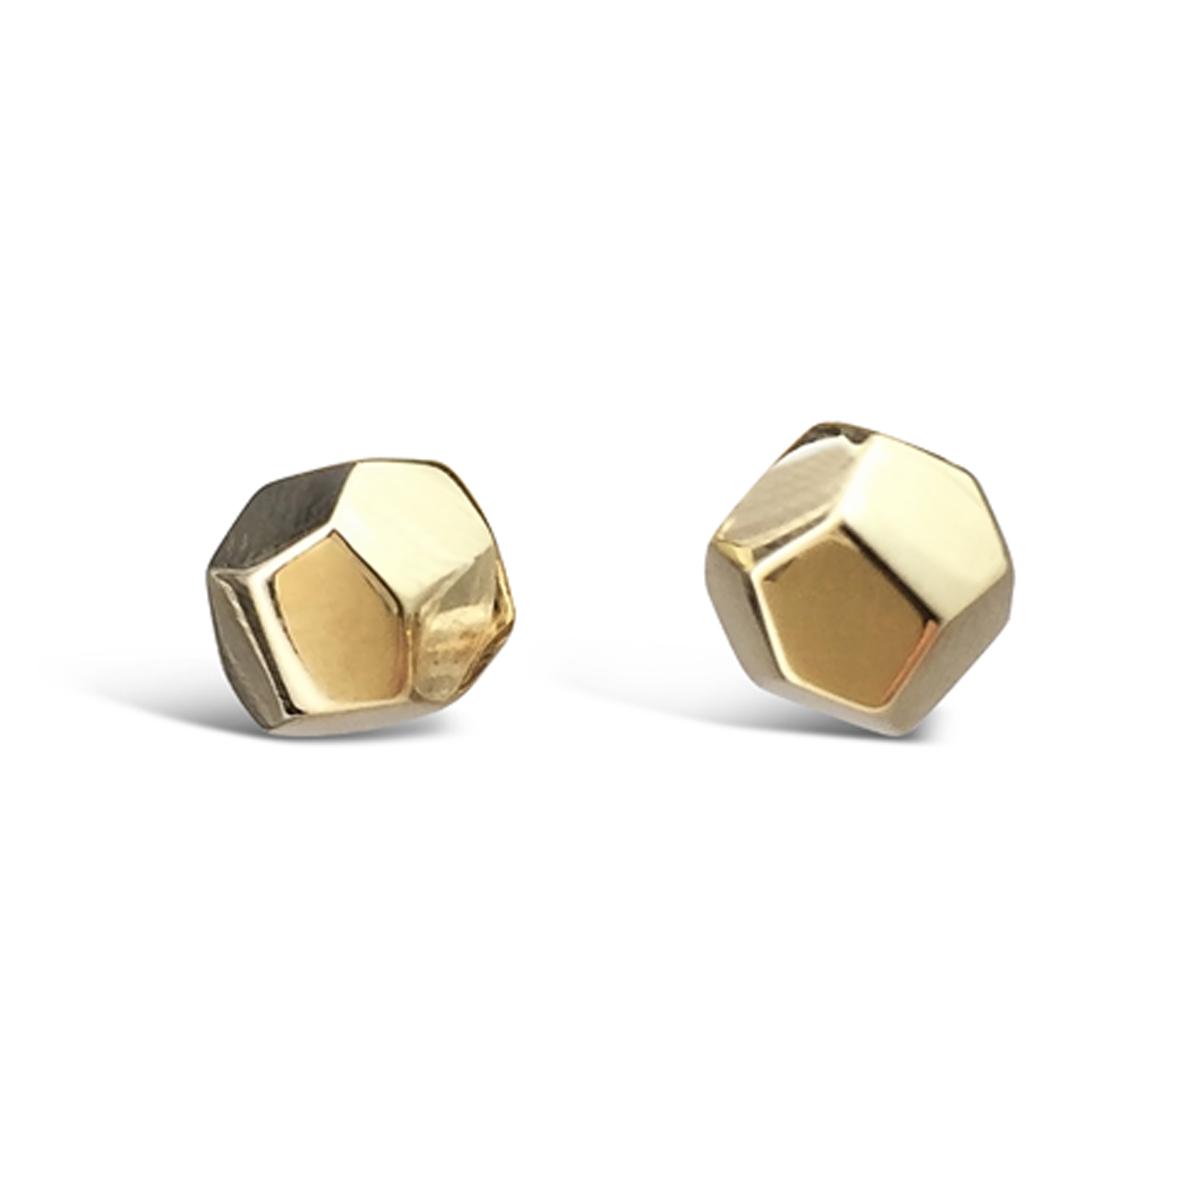 Decca earrings 9ct yellow gold